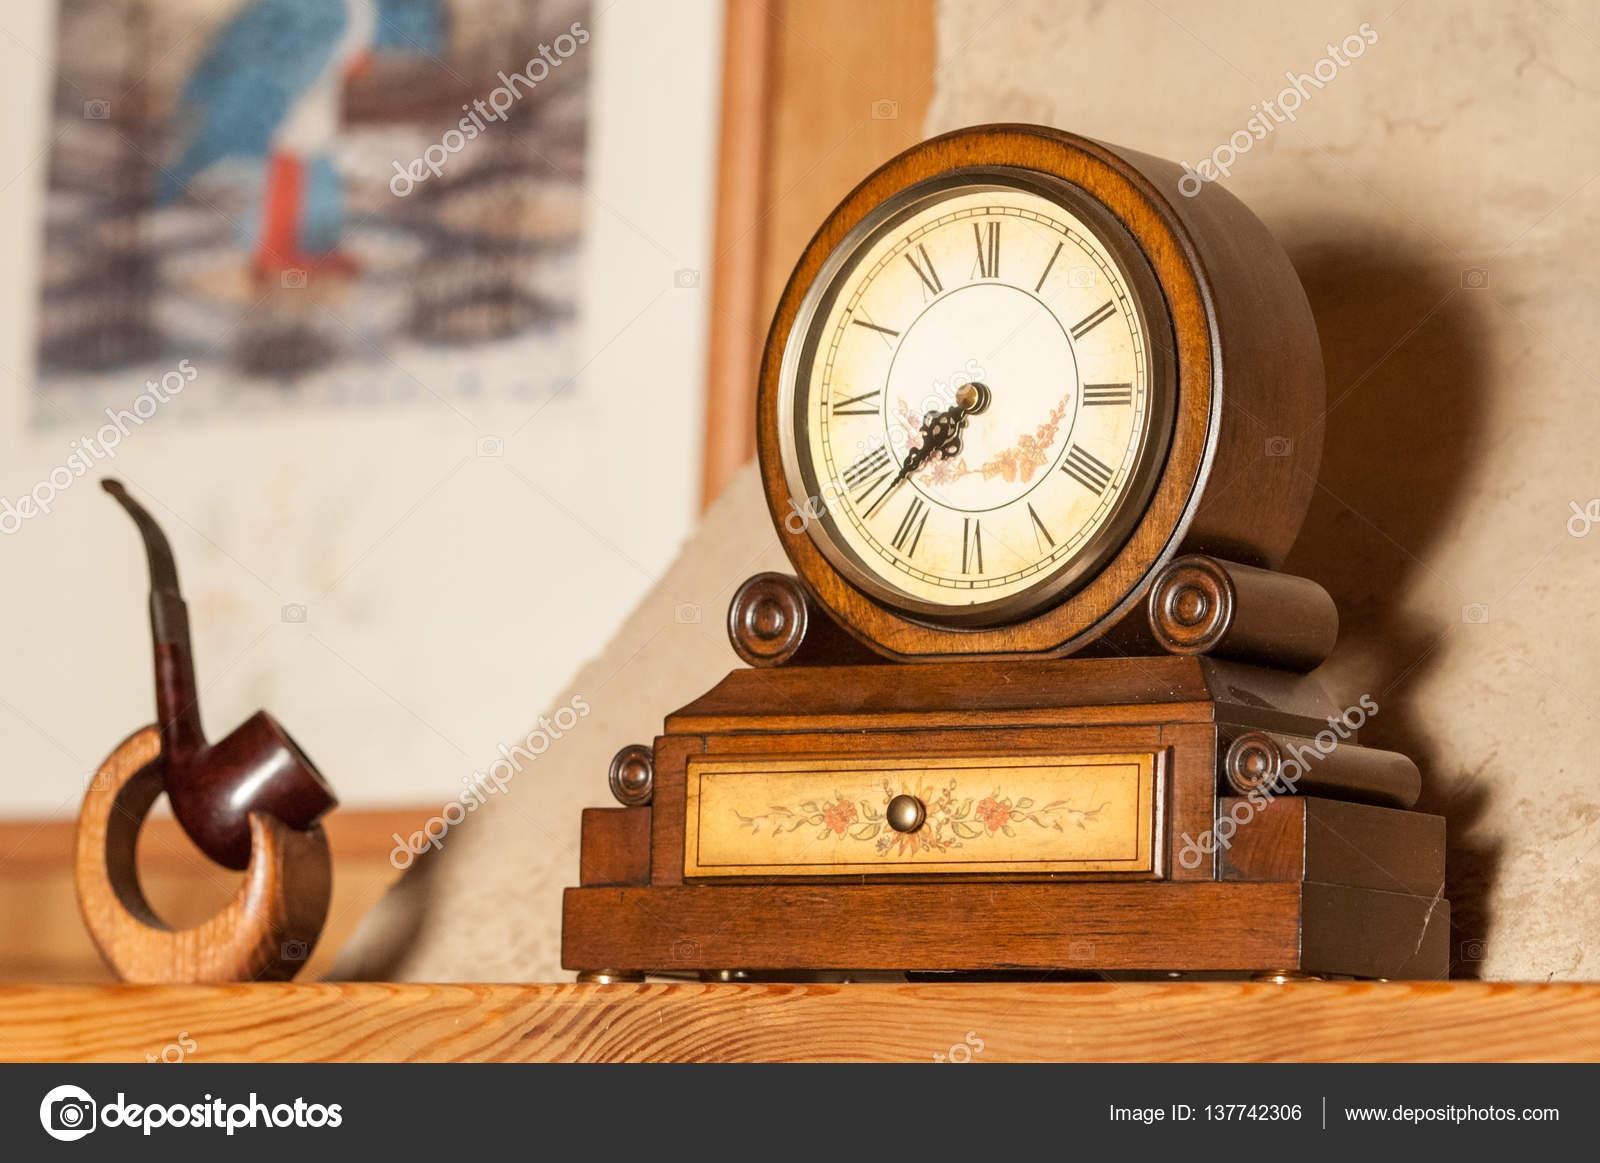 Vintage Holz Uhr Und Tabakpfeife Stehen Auf Dem Kaminsims U2014 Stockfoto